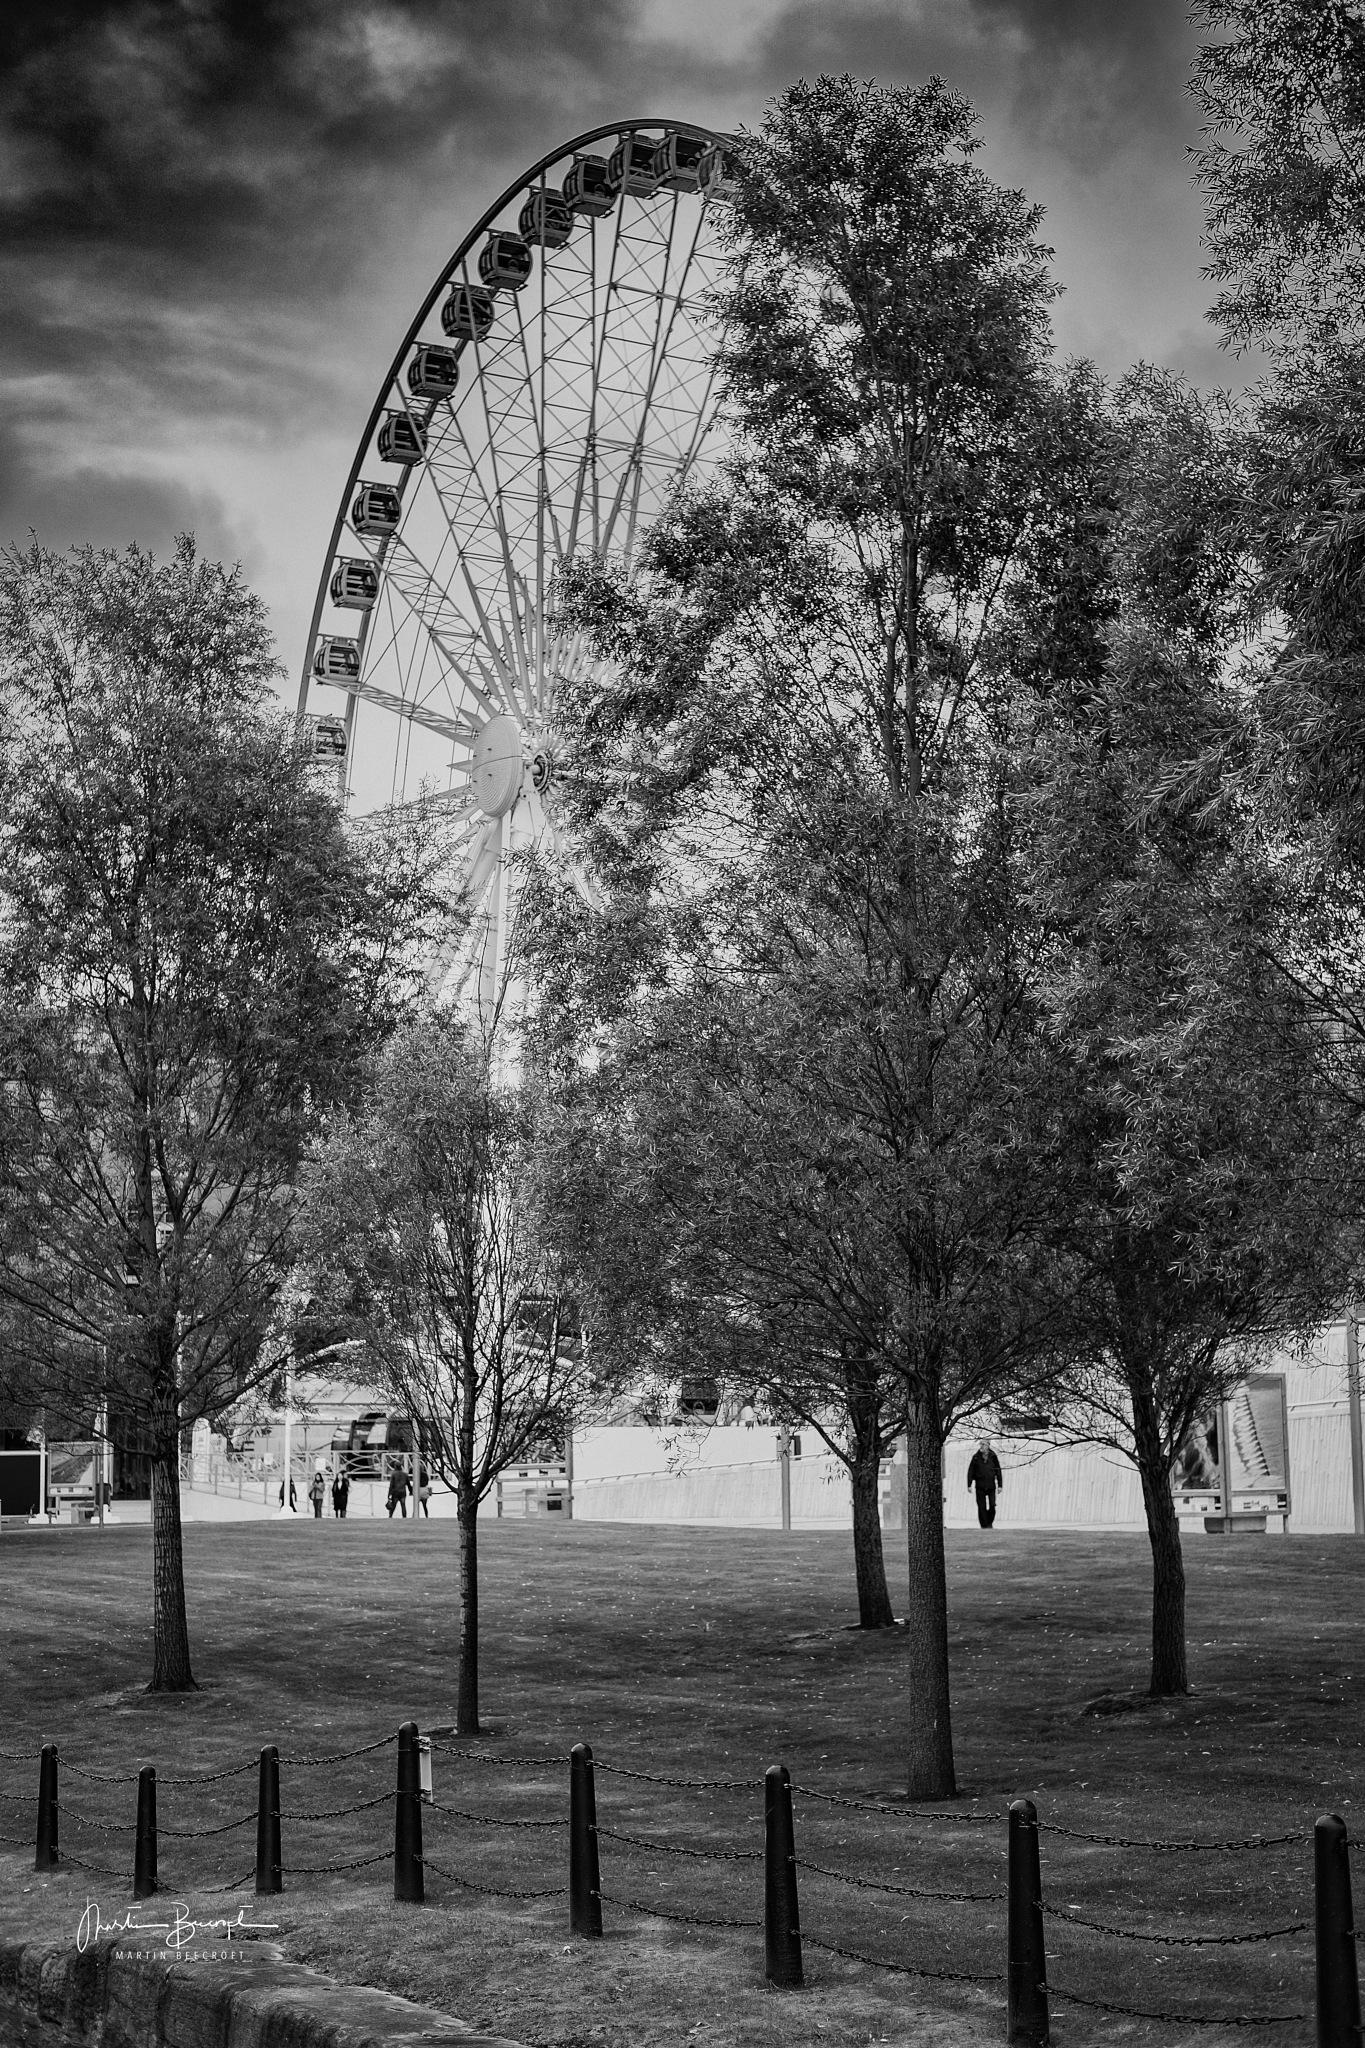 Big Wheel by Martin Beecroft